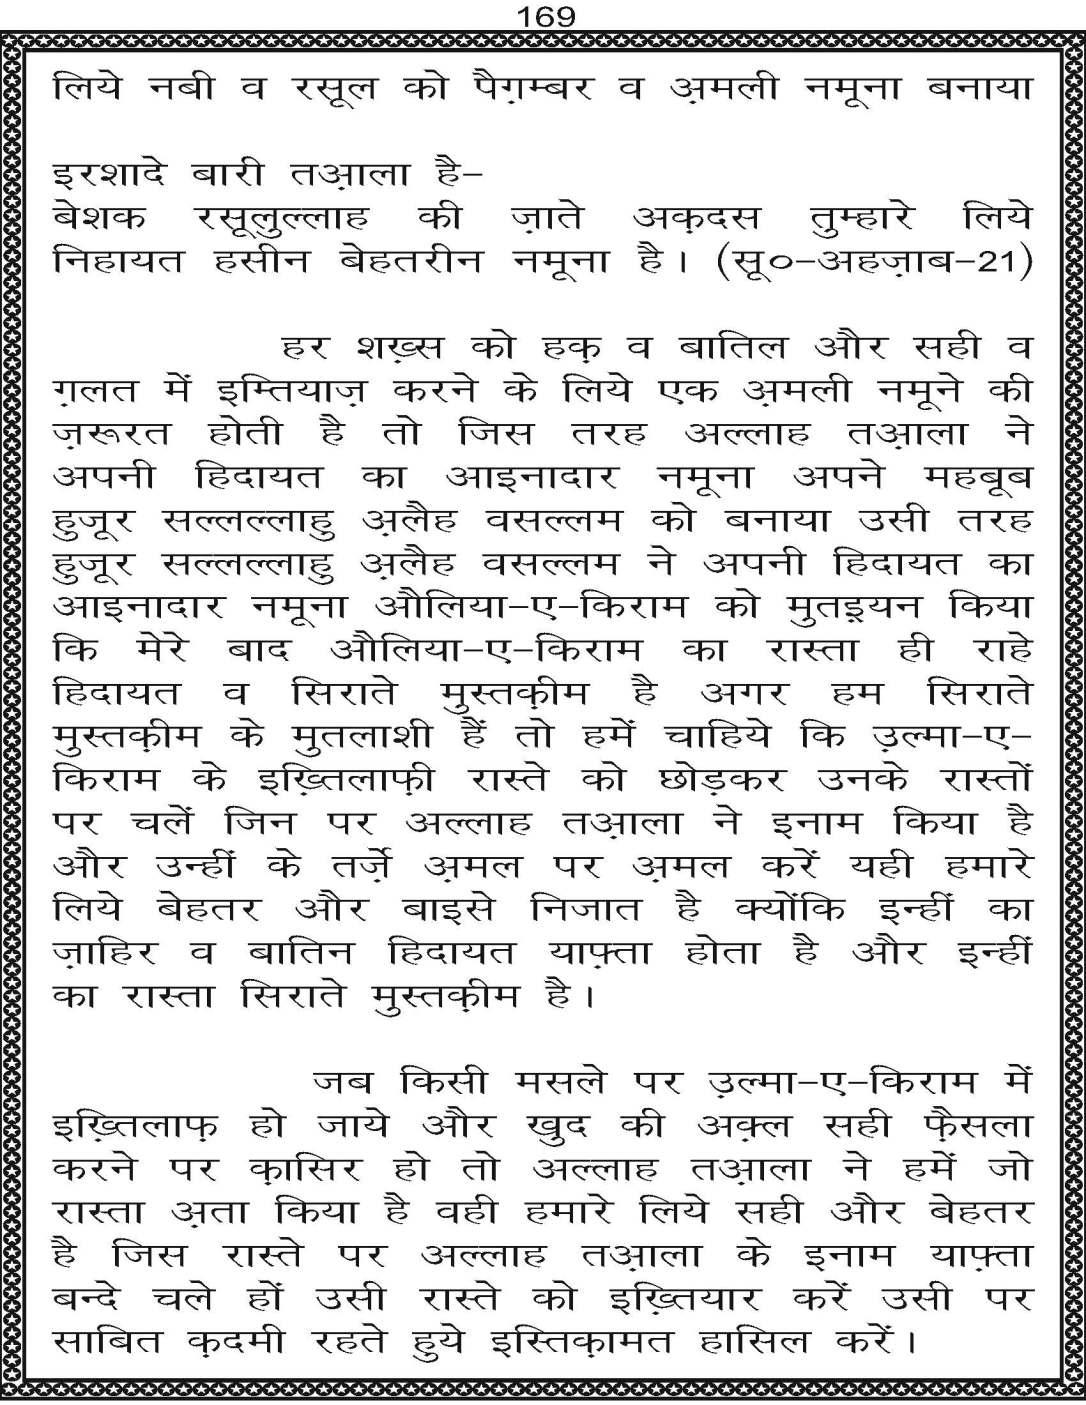 AzmateTaziyadari_Page_169